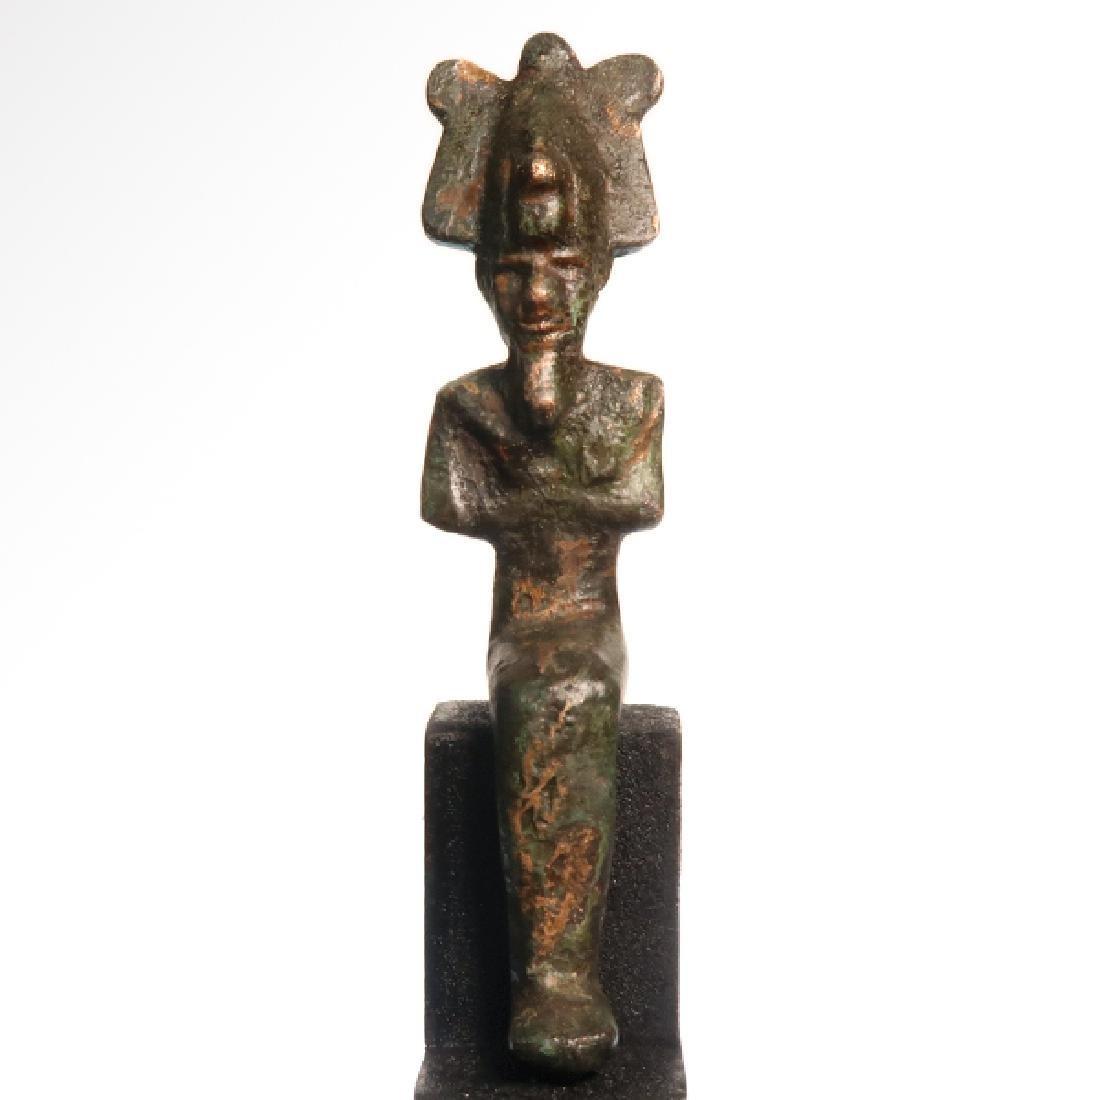 Small Egyptian Bronze Figure of Osiris, c. 600 B.C.